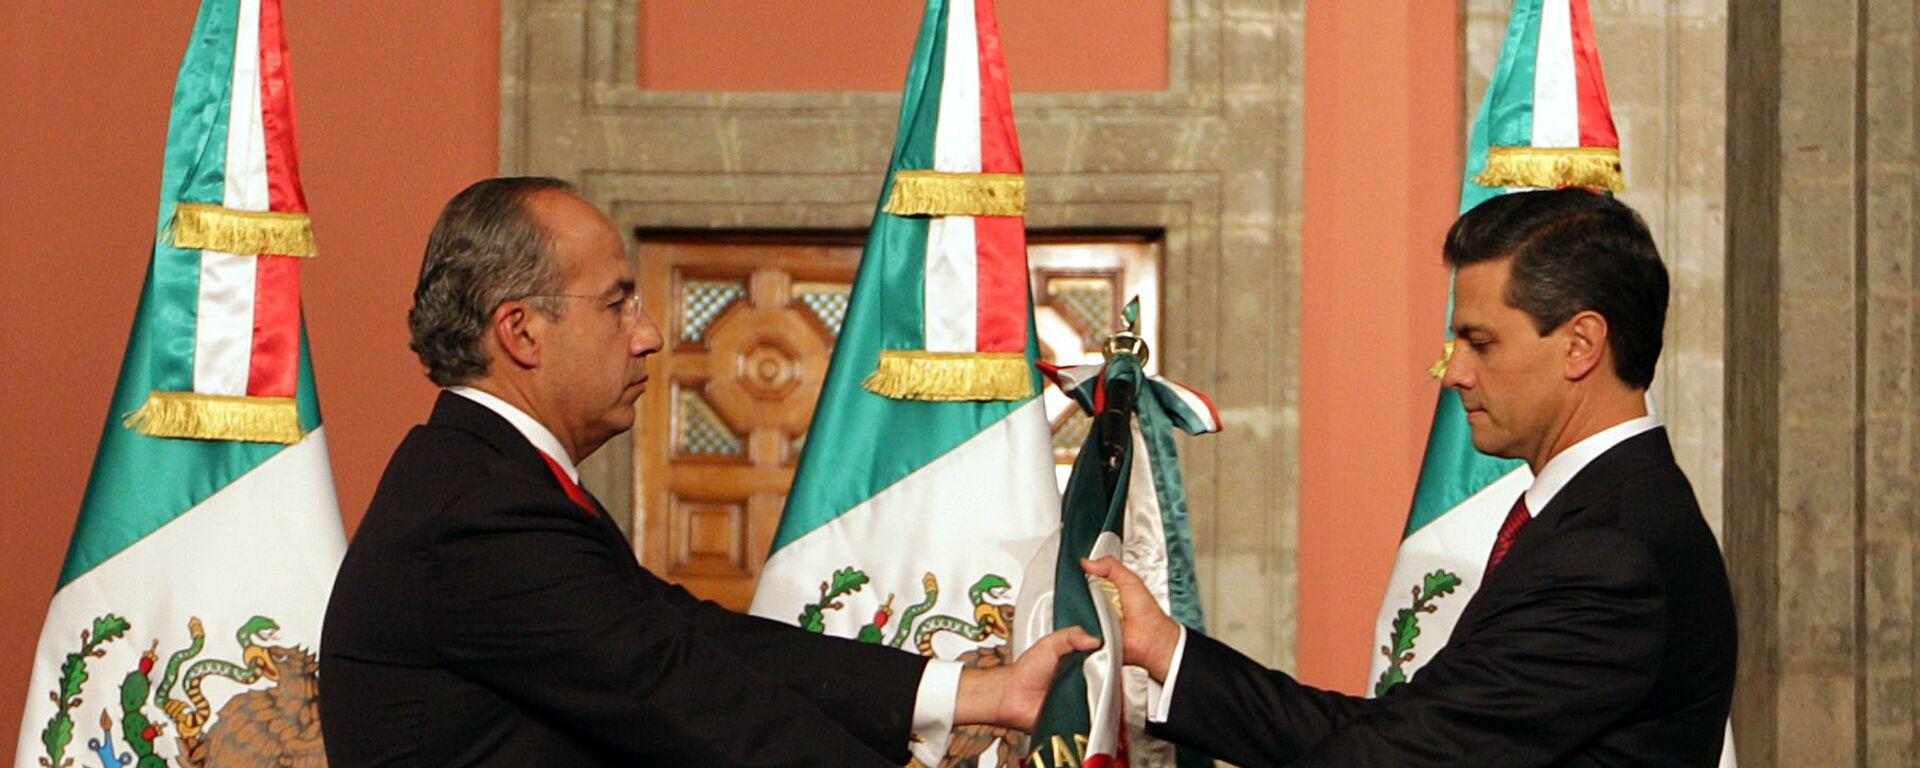 Felipe Calderón y Enrique Peña Nieto, expresidentes de México - Sputnik Mundo, 1920, 27.10.2020